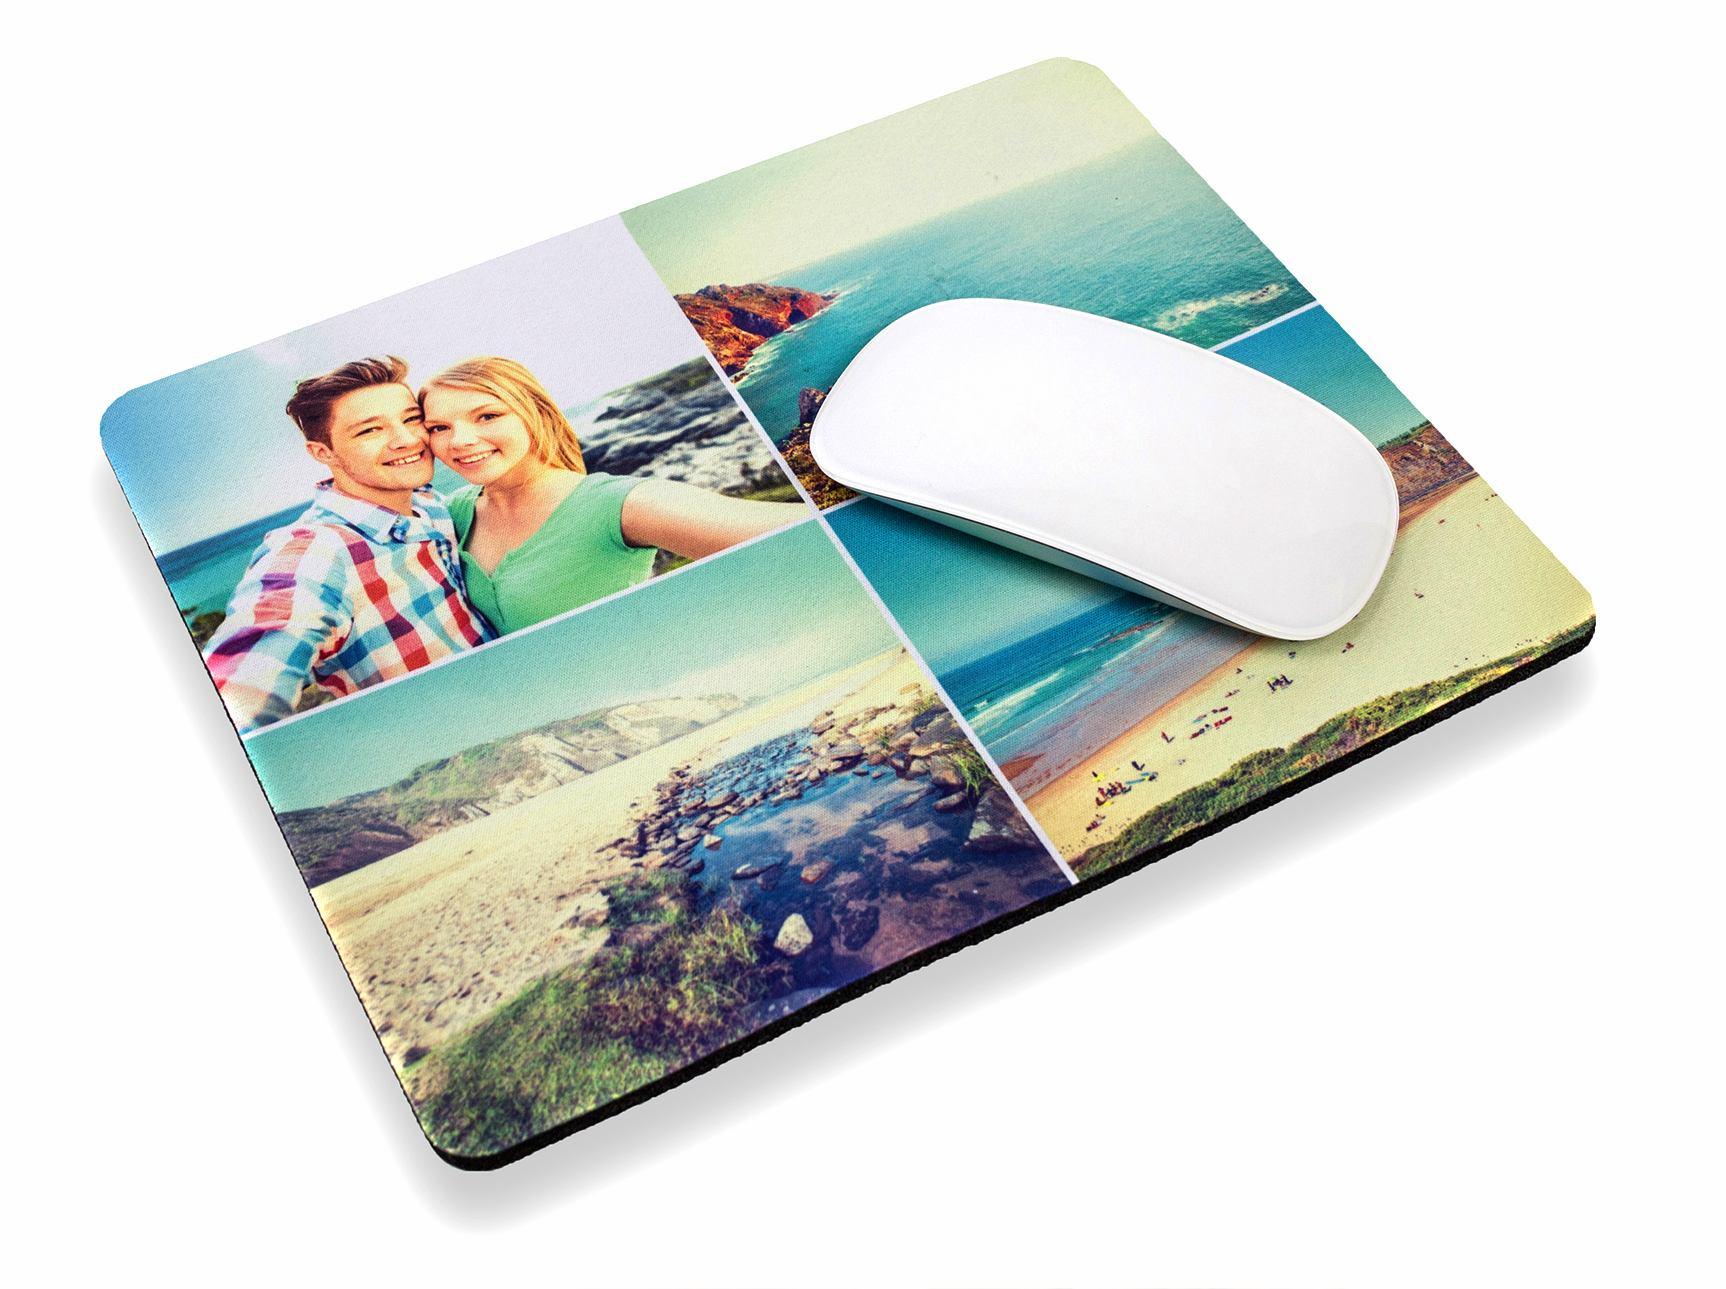 Dashing Personalised Mouse Mats Pixa Prints Ireland Custom Mouse Pads Reddit Custom Mouse Pads Staples custom Custom Mouse Pad